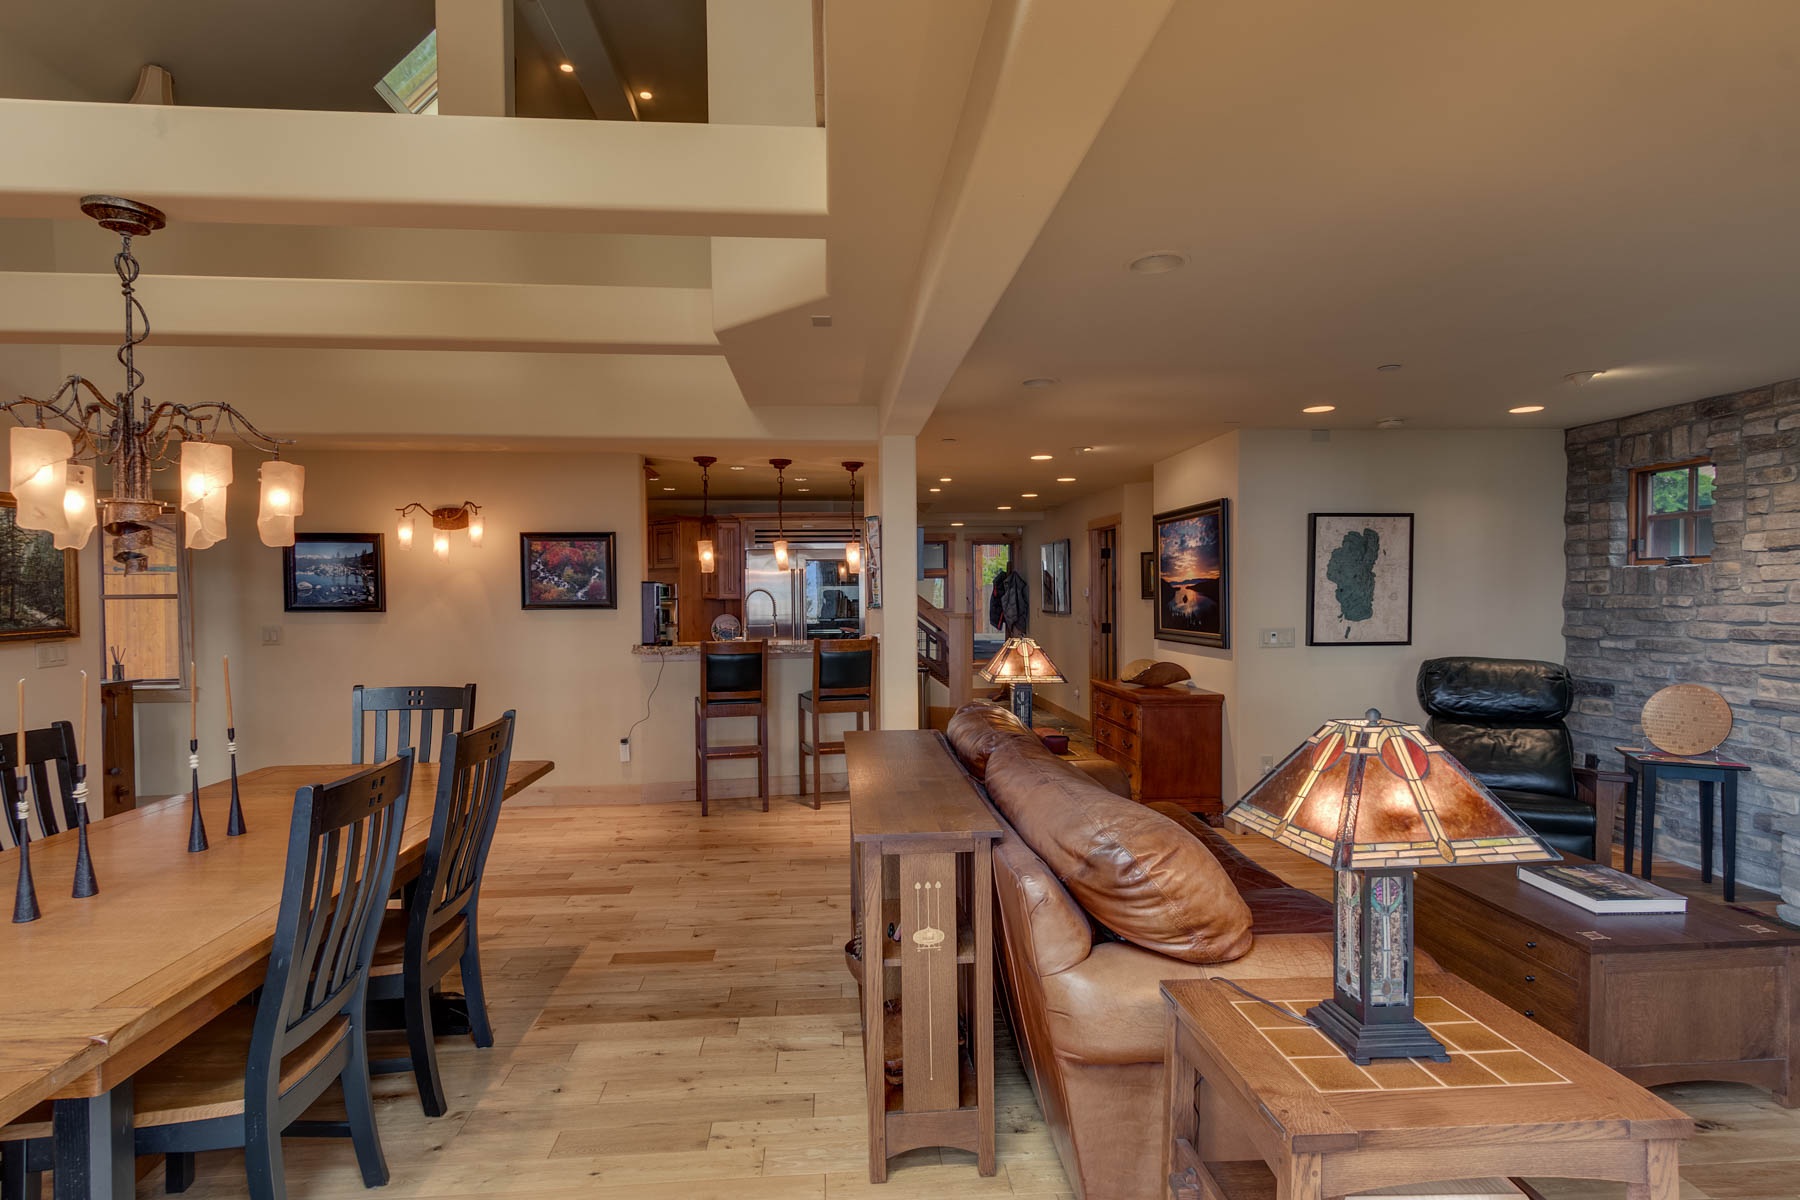 Additional photo for property listing at 5019 California Street, Carnelian Bay, Ca 96140 5019 California Street Carnelian Bay, California 96140 Estados Unidos